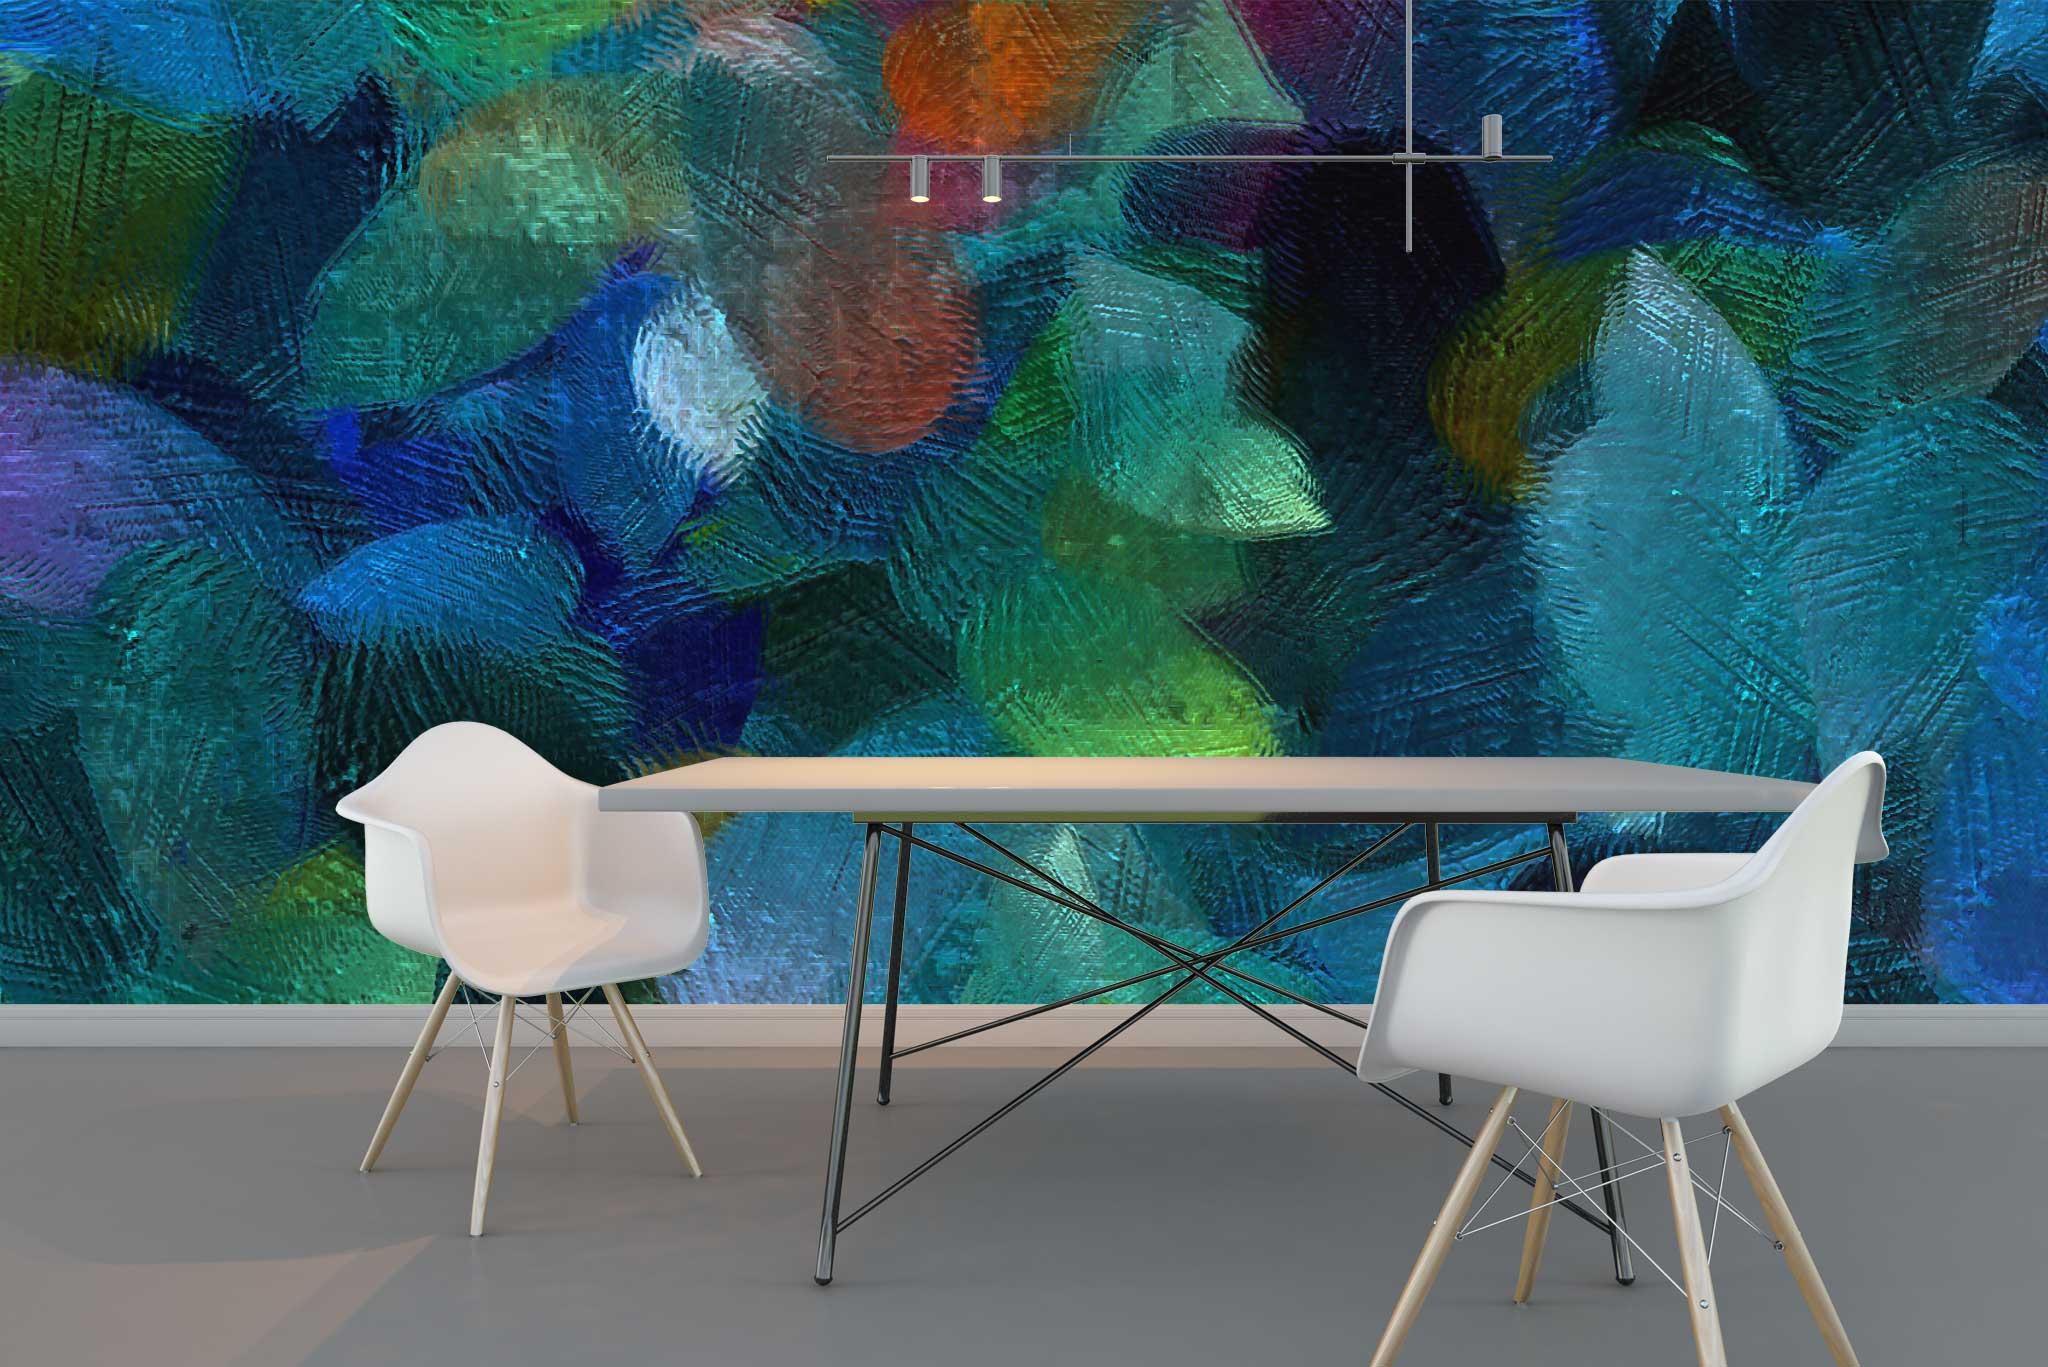 tapet-fototapet-comanda-personalizat-bucuresti-perete-special-lux-model-pictura-tuse-culori-albastru